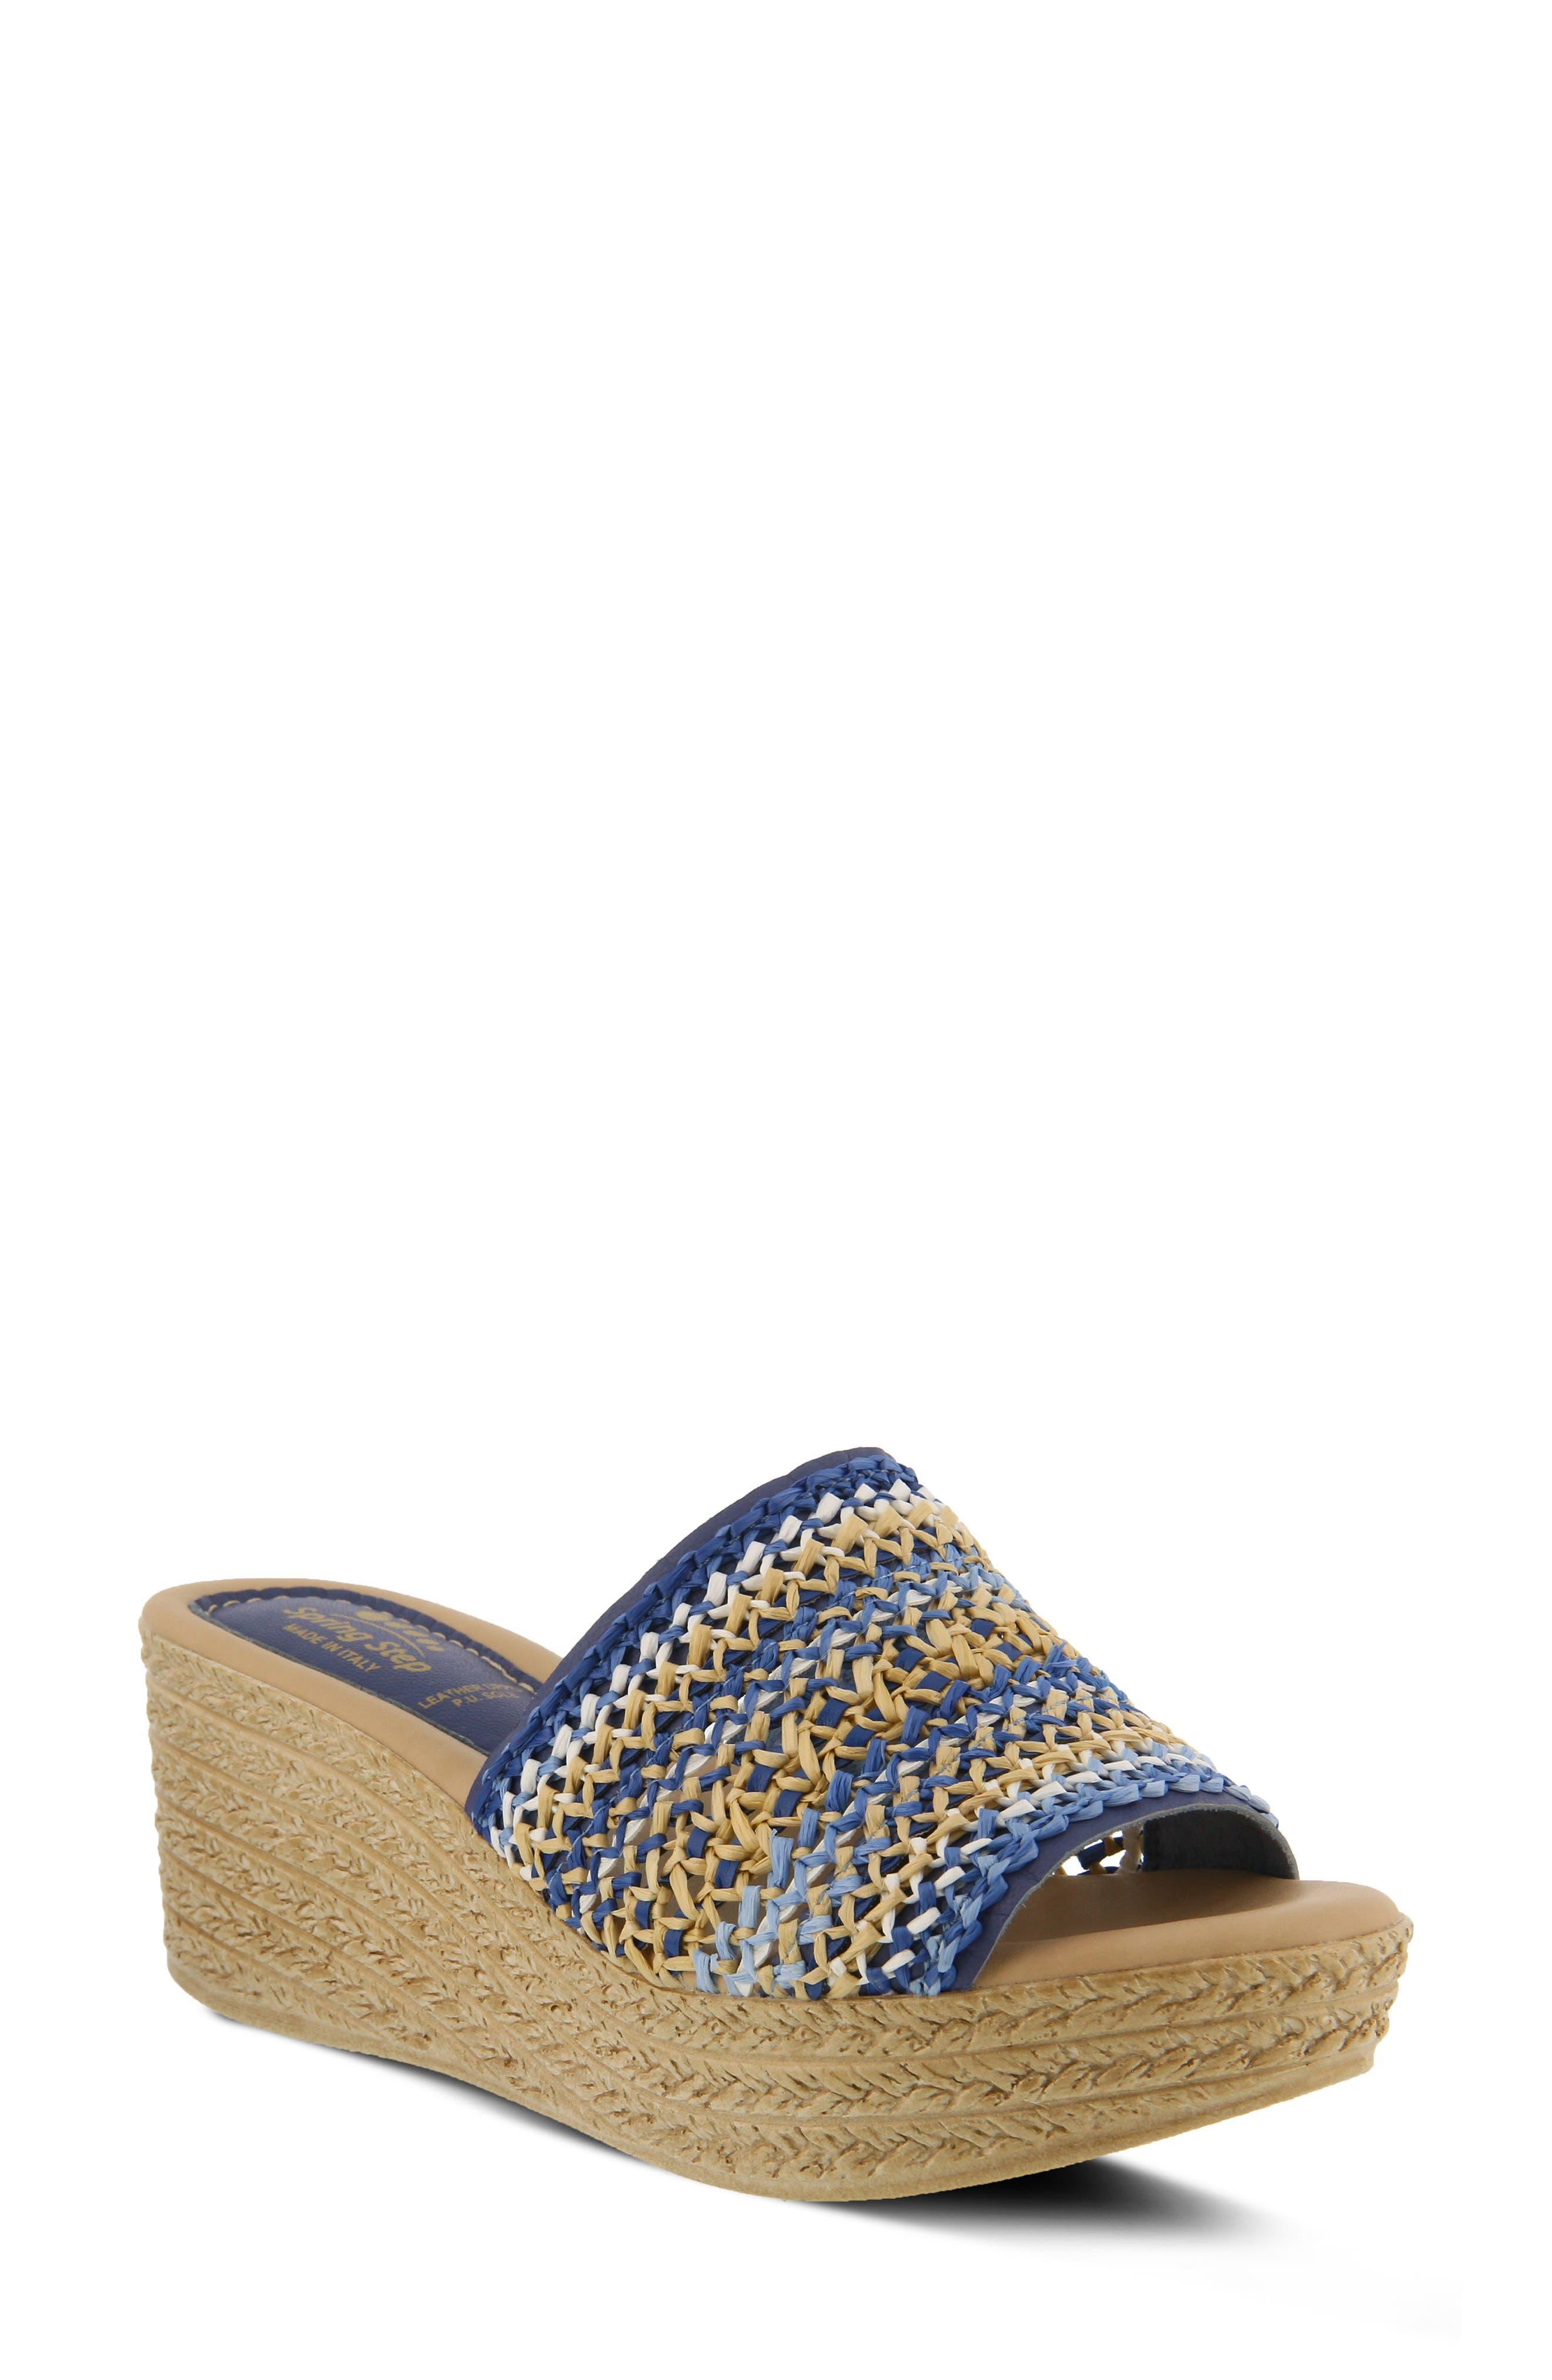 Calci Espadrille Wedge Sandal,                             Main thumbnail 3, color,